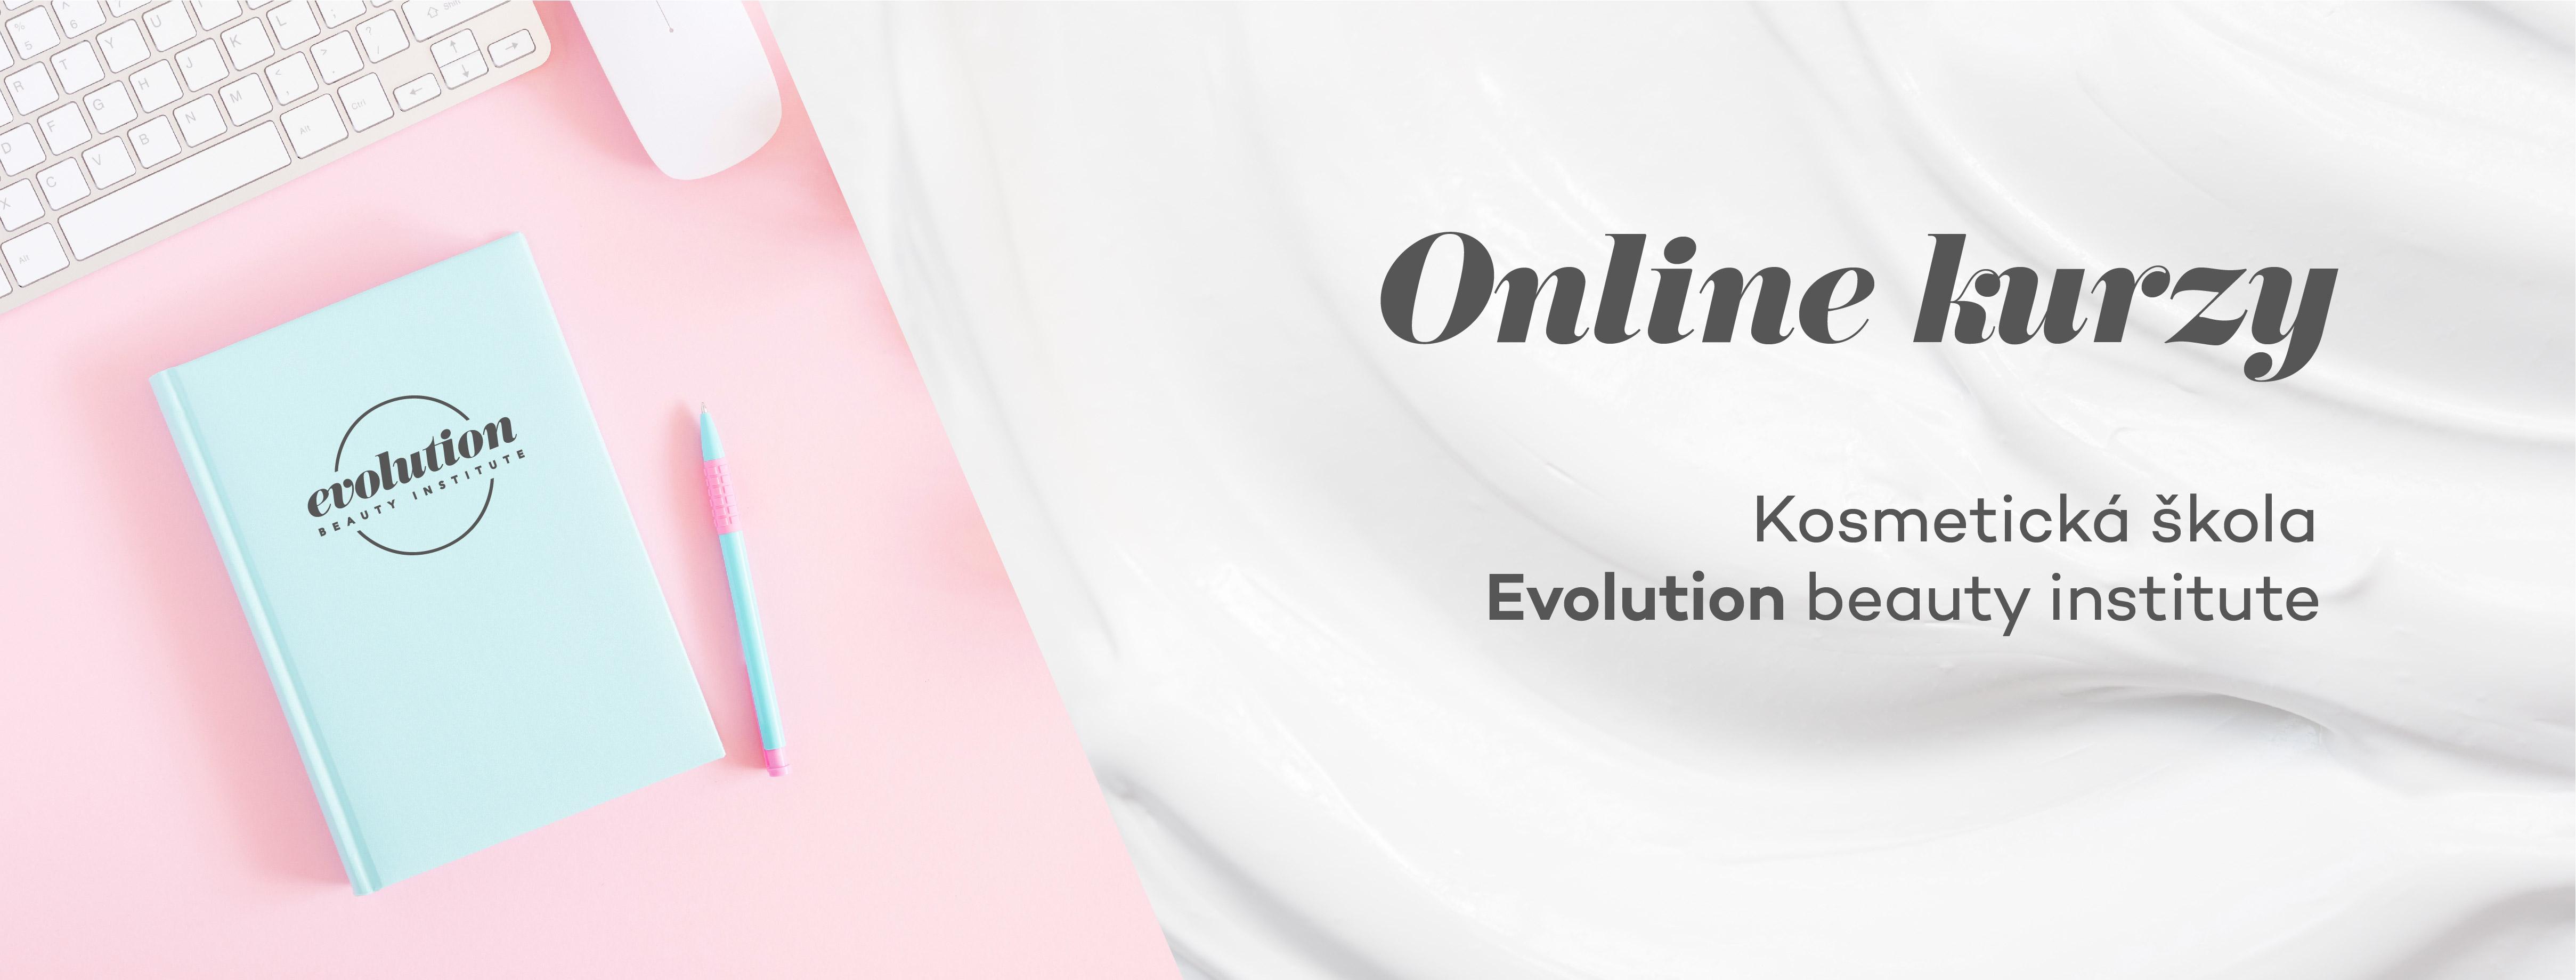 Online kurzy